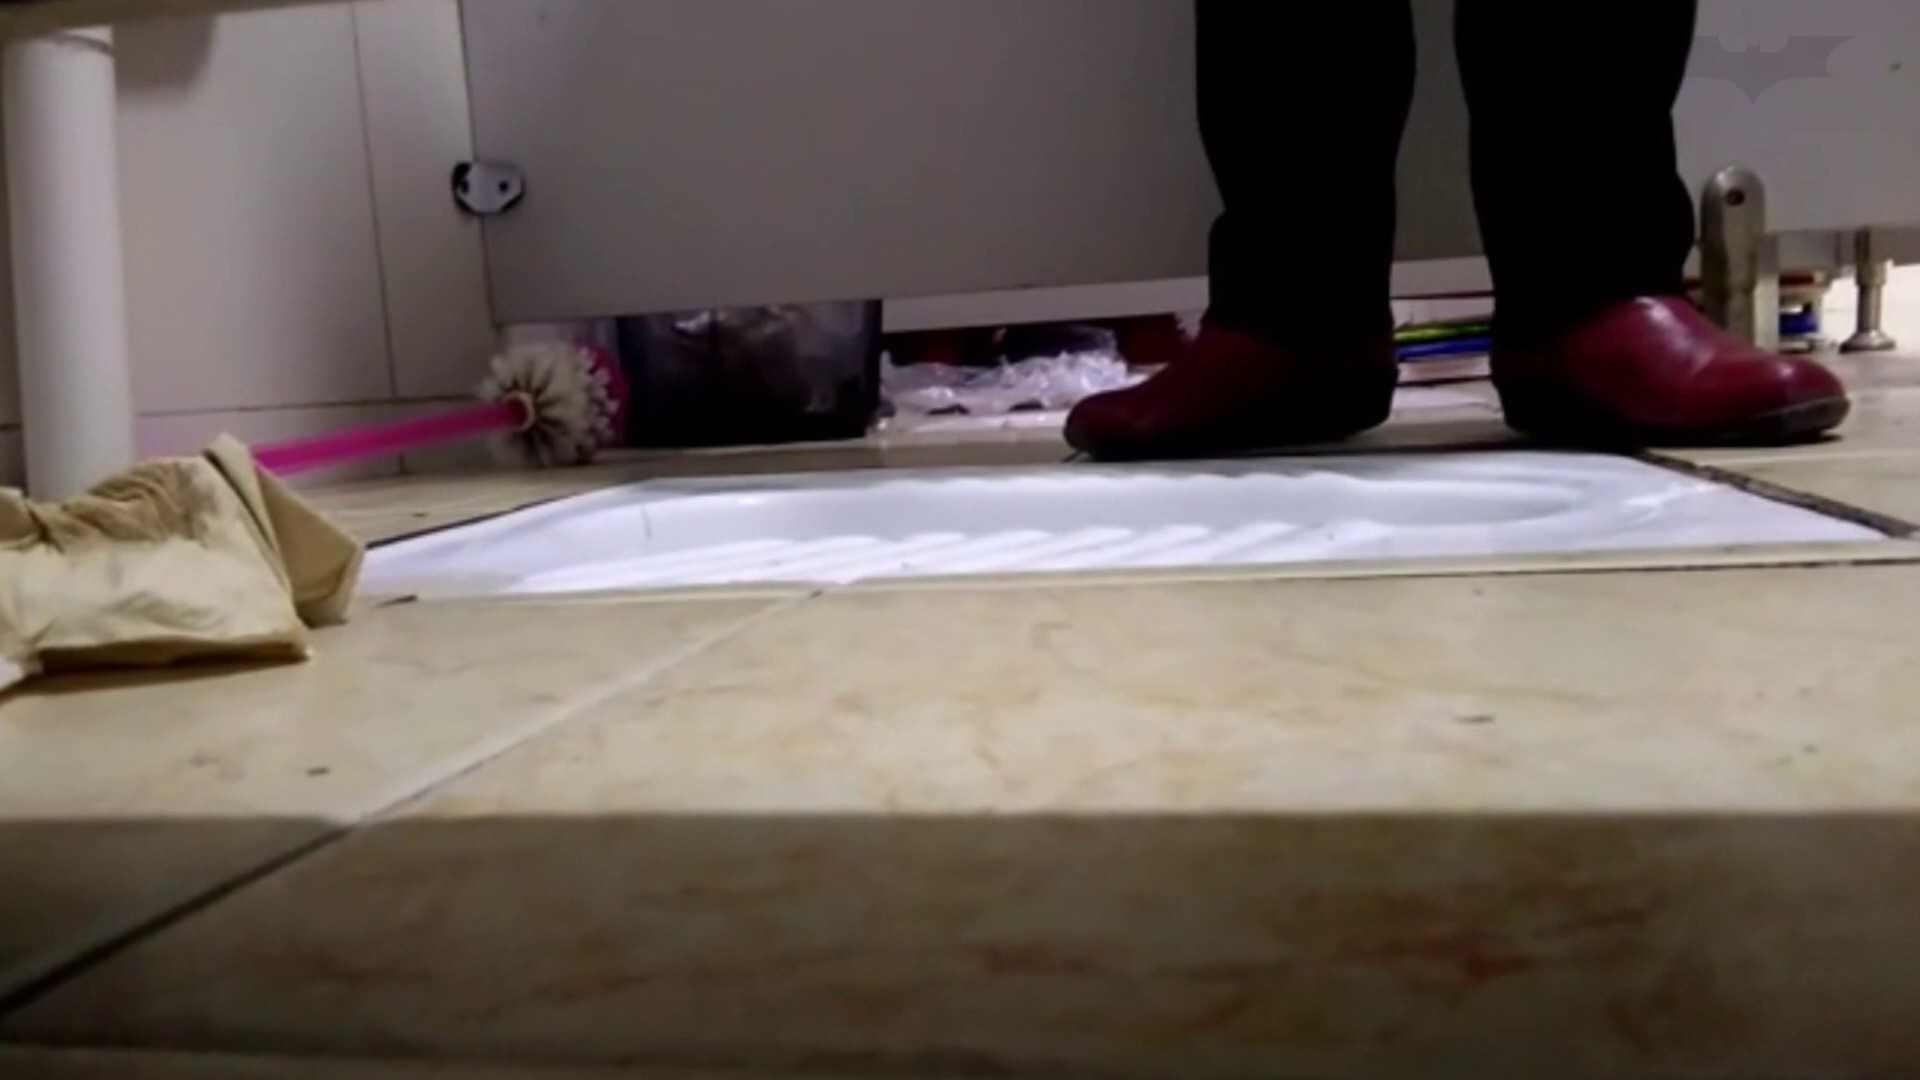 芸術大学ガチ潜入盗撮 JD盗撮 美女の洗面所の秘密 Vol.105 盗撮 AV無料 29pic 27